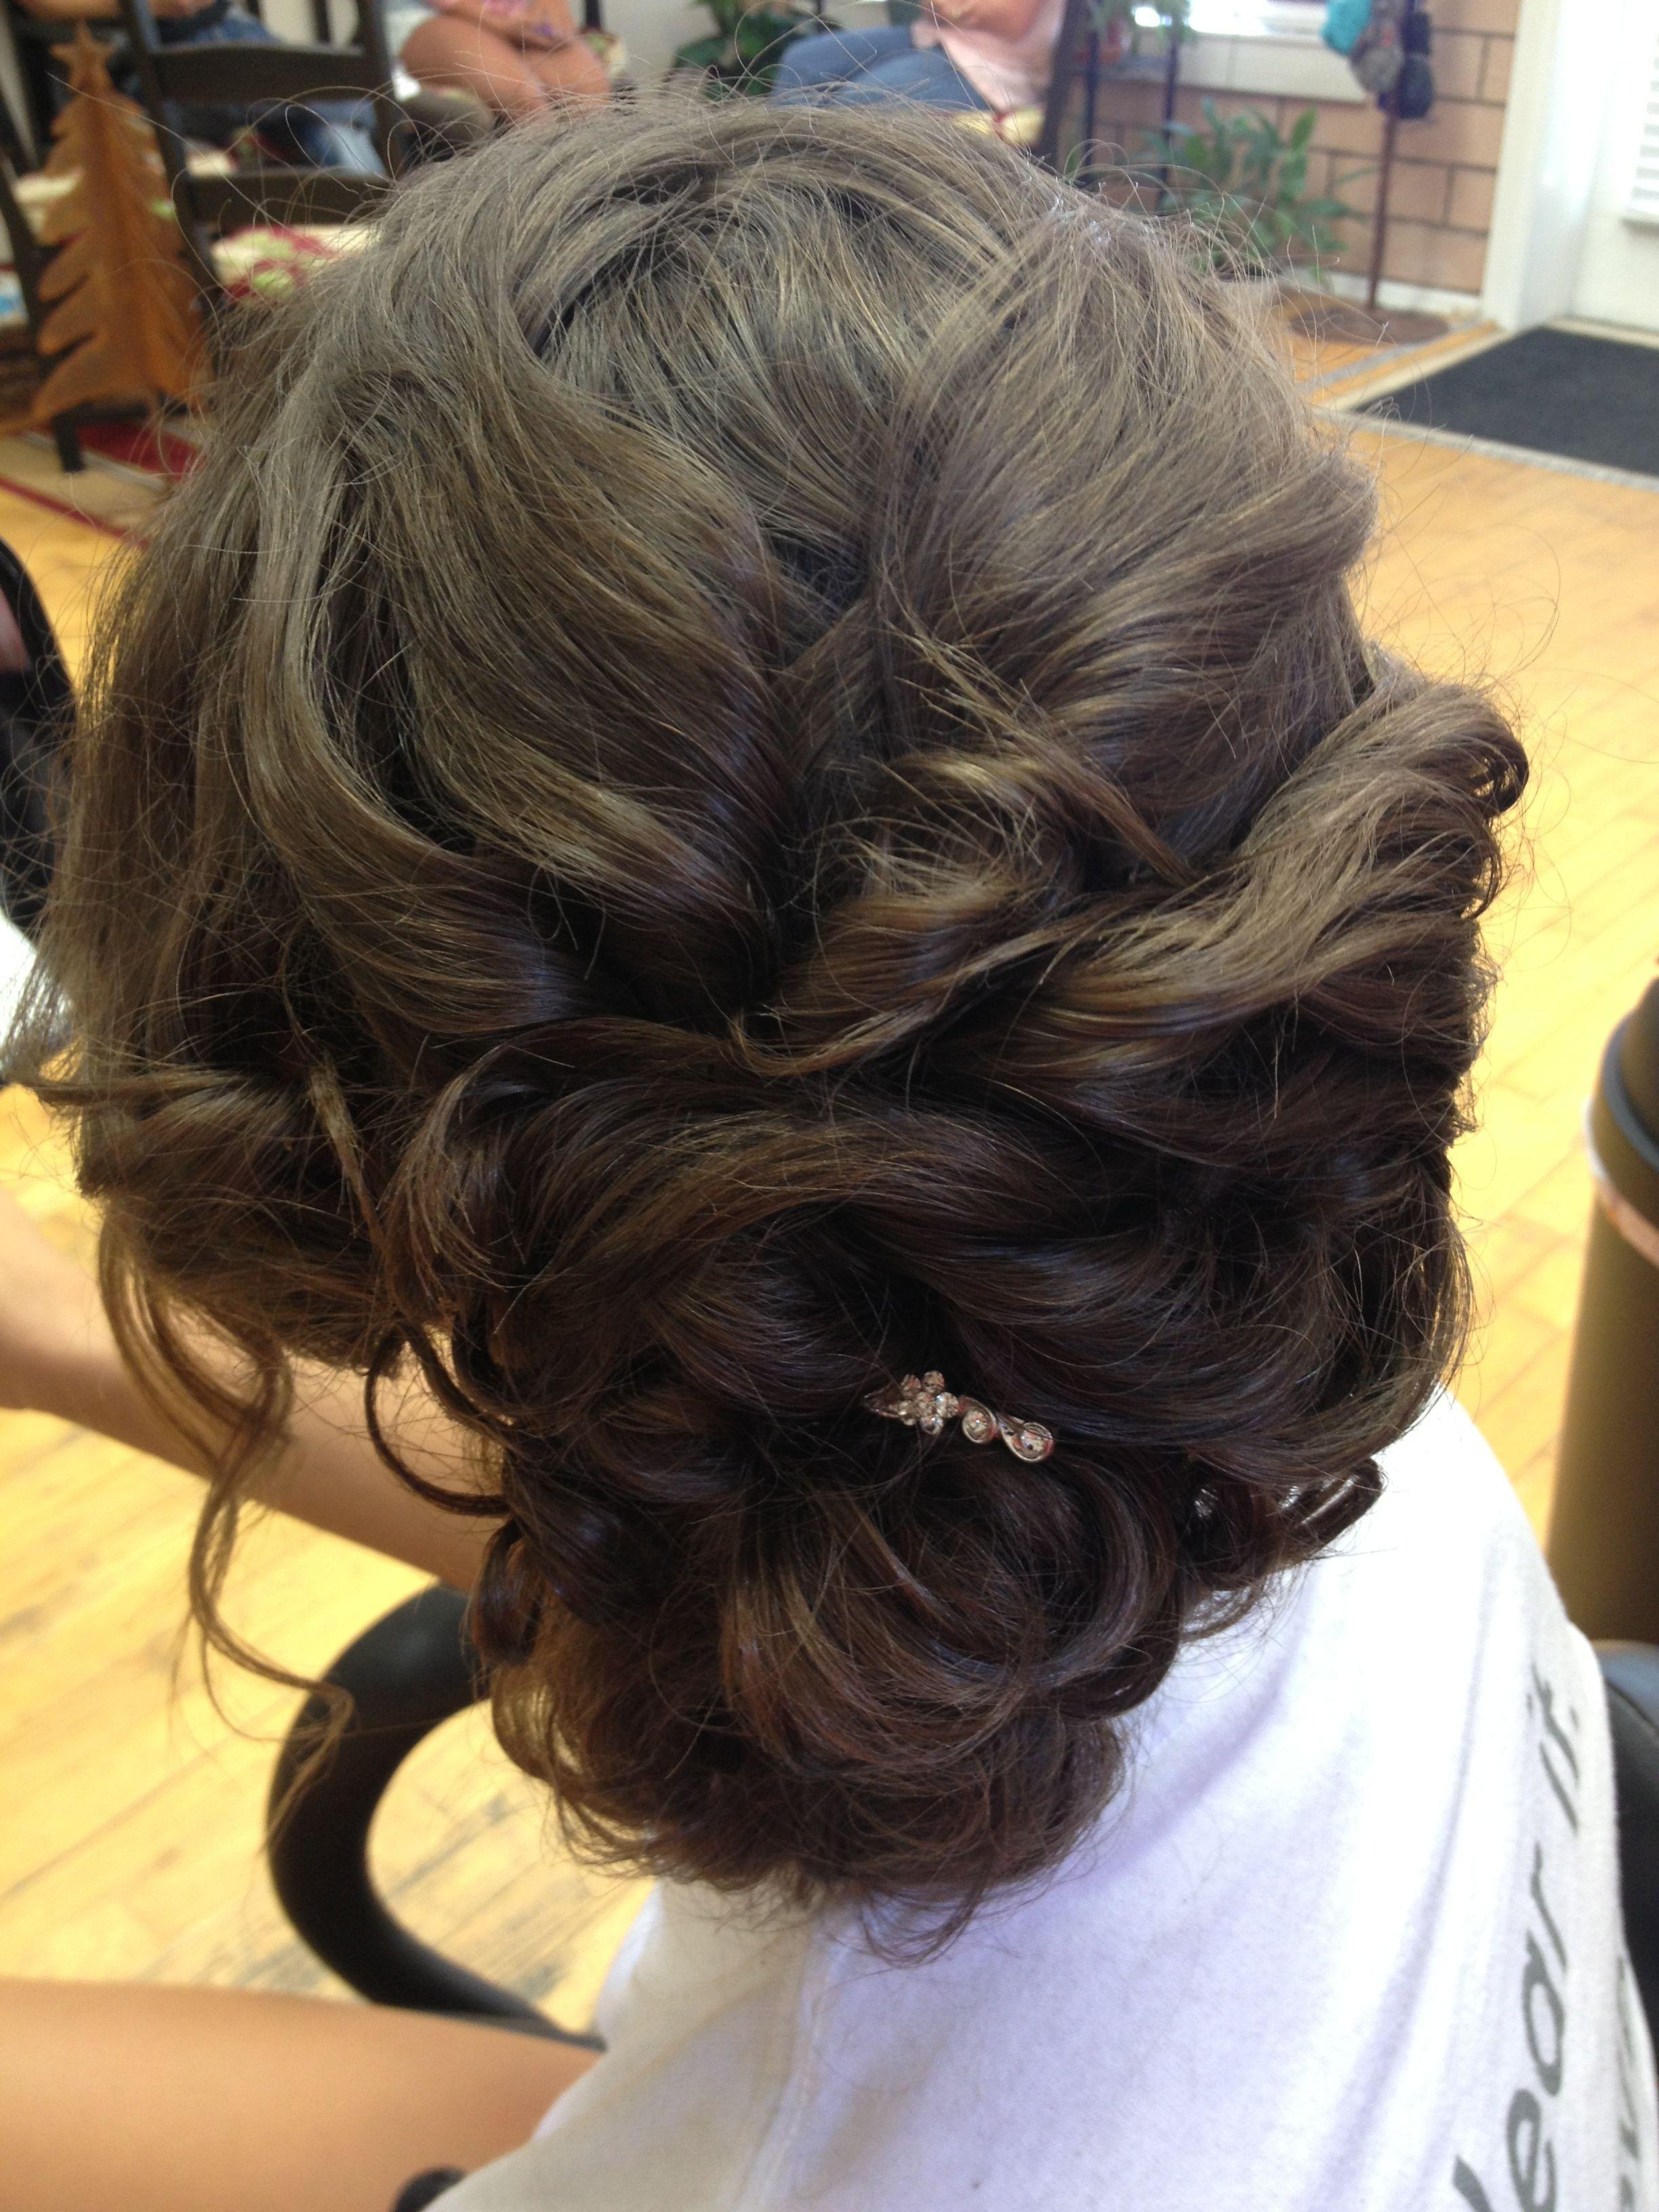 Prom updo Tammy Galvan 940-300-1845. Amici Hair Salon | Long hair styles, Wedding updo, Hair styles